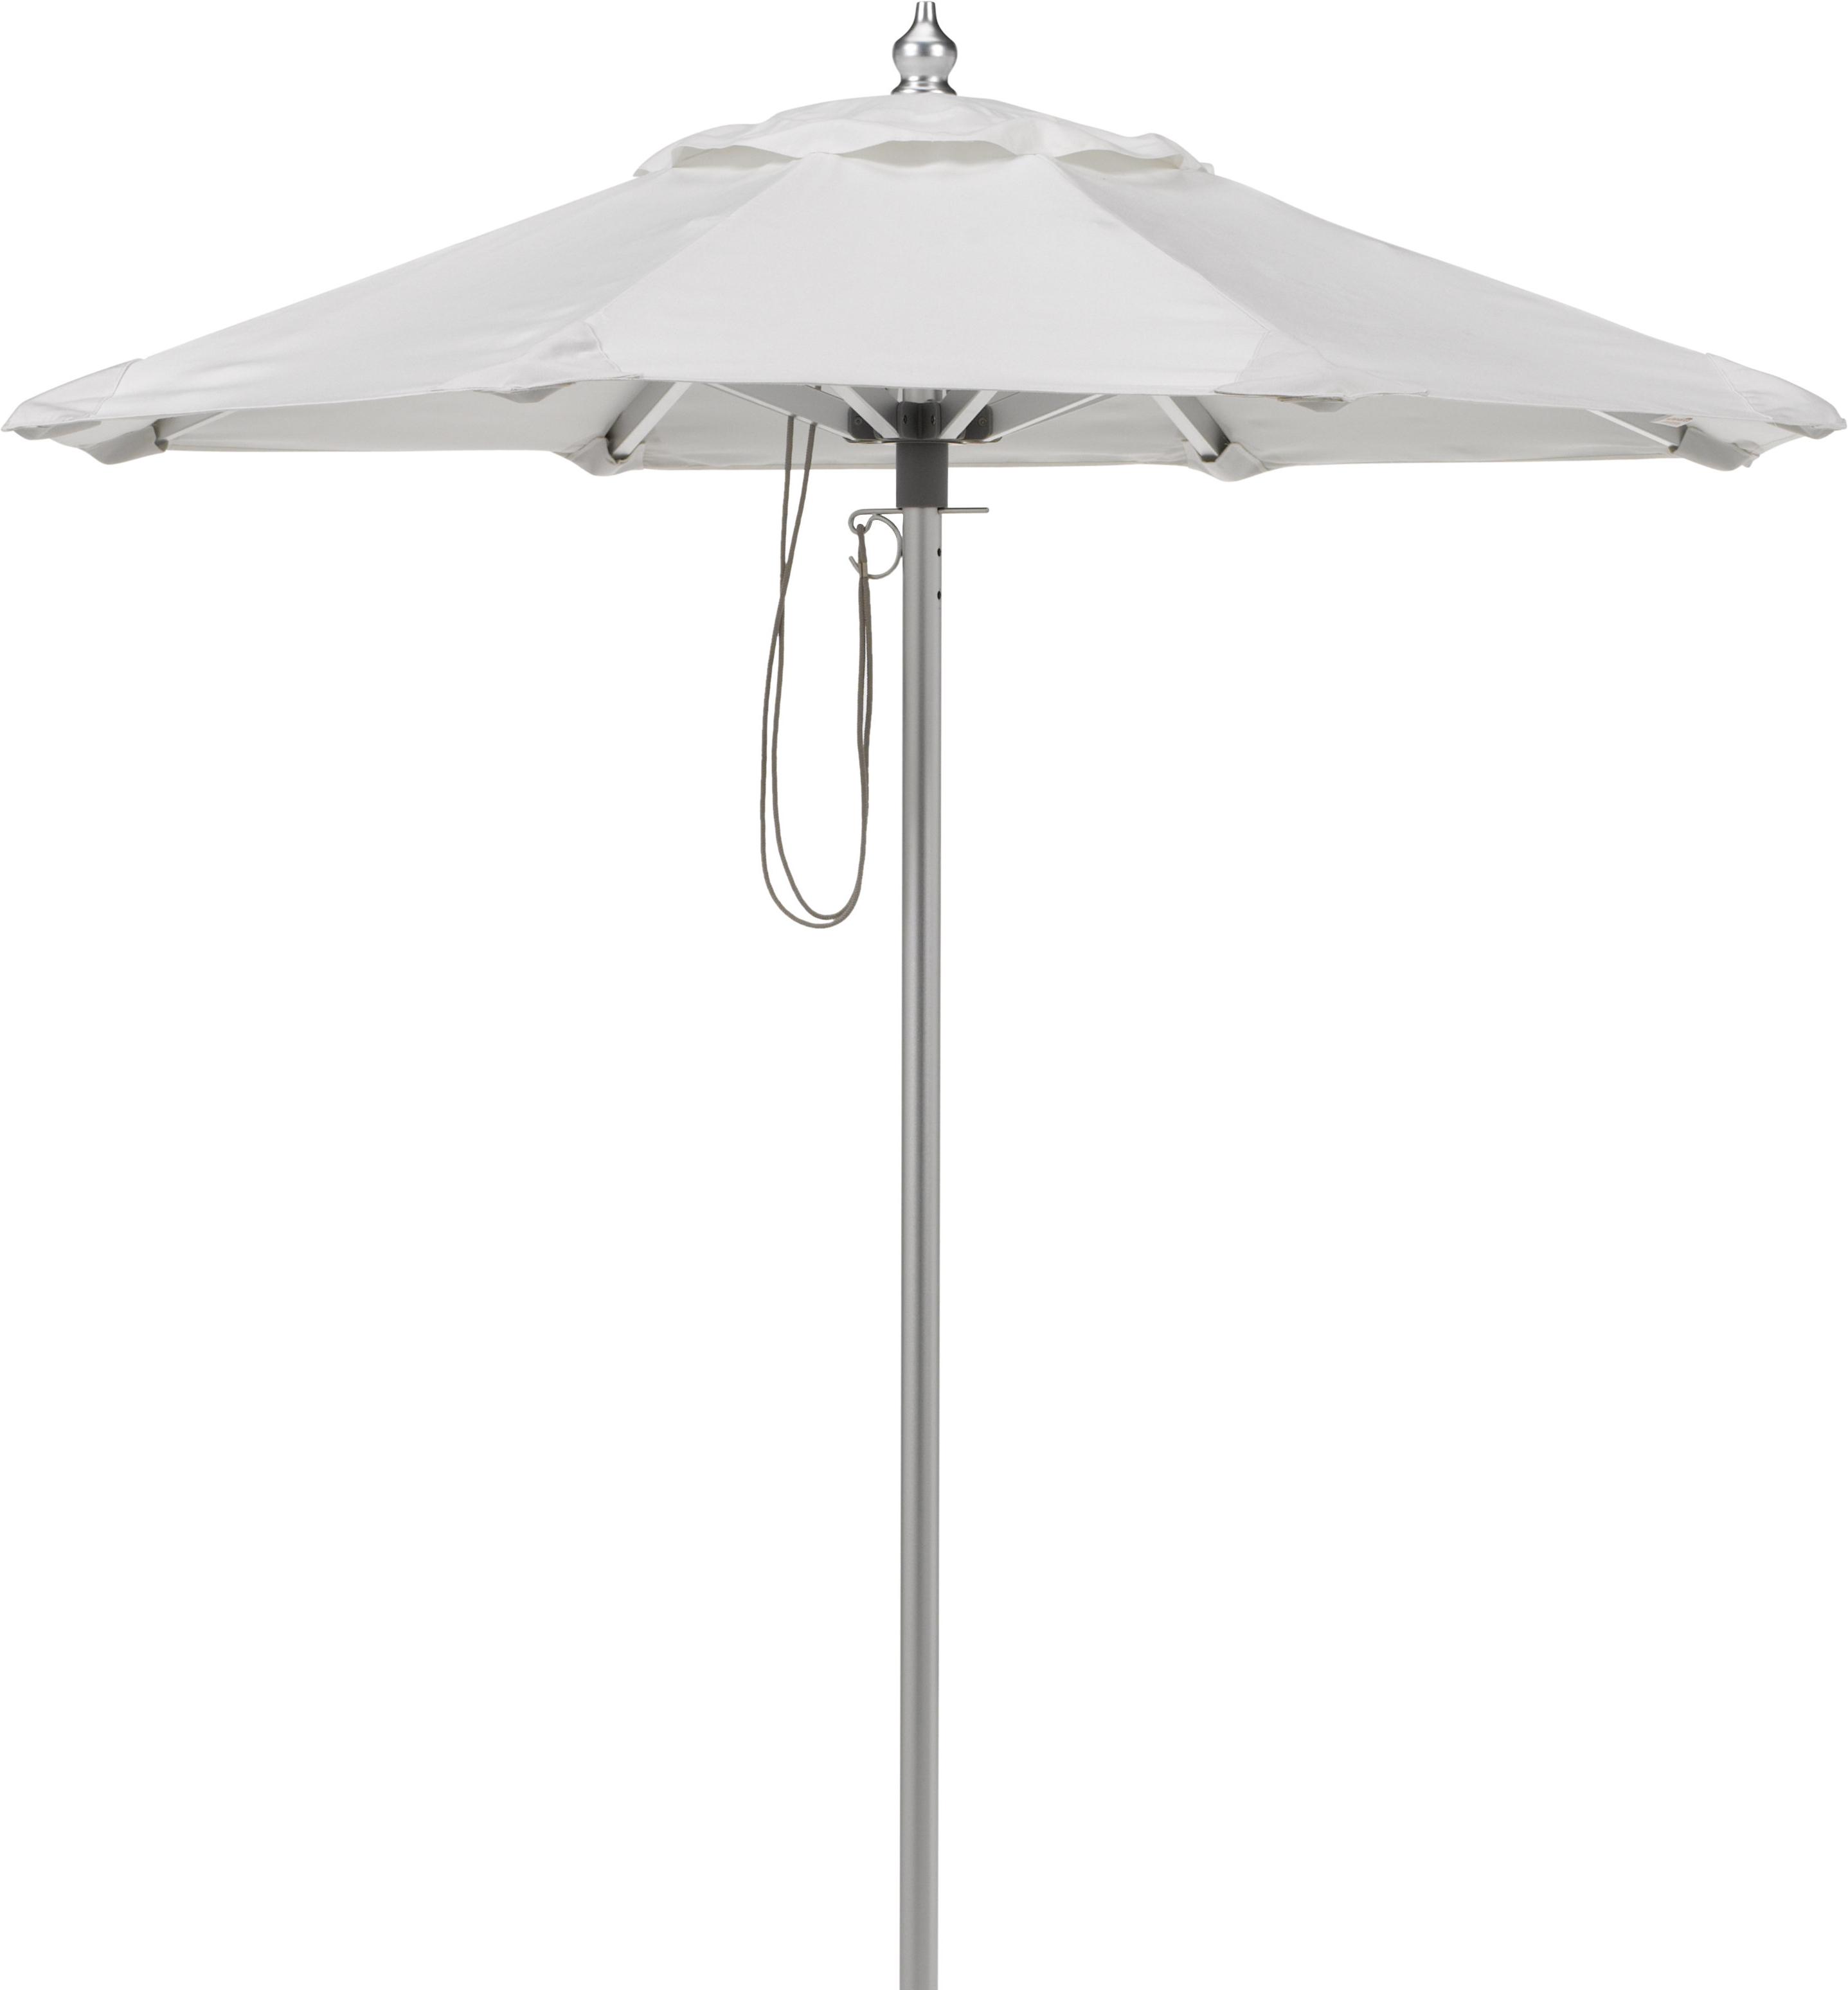 Stambaugh 6' Market Umbrella For Most Current Caravelle Market Umbrellas (View 18 of 20)